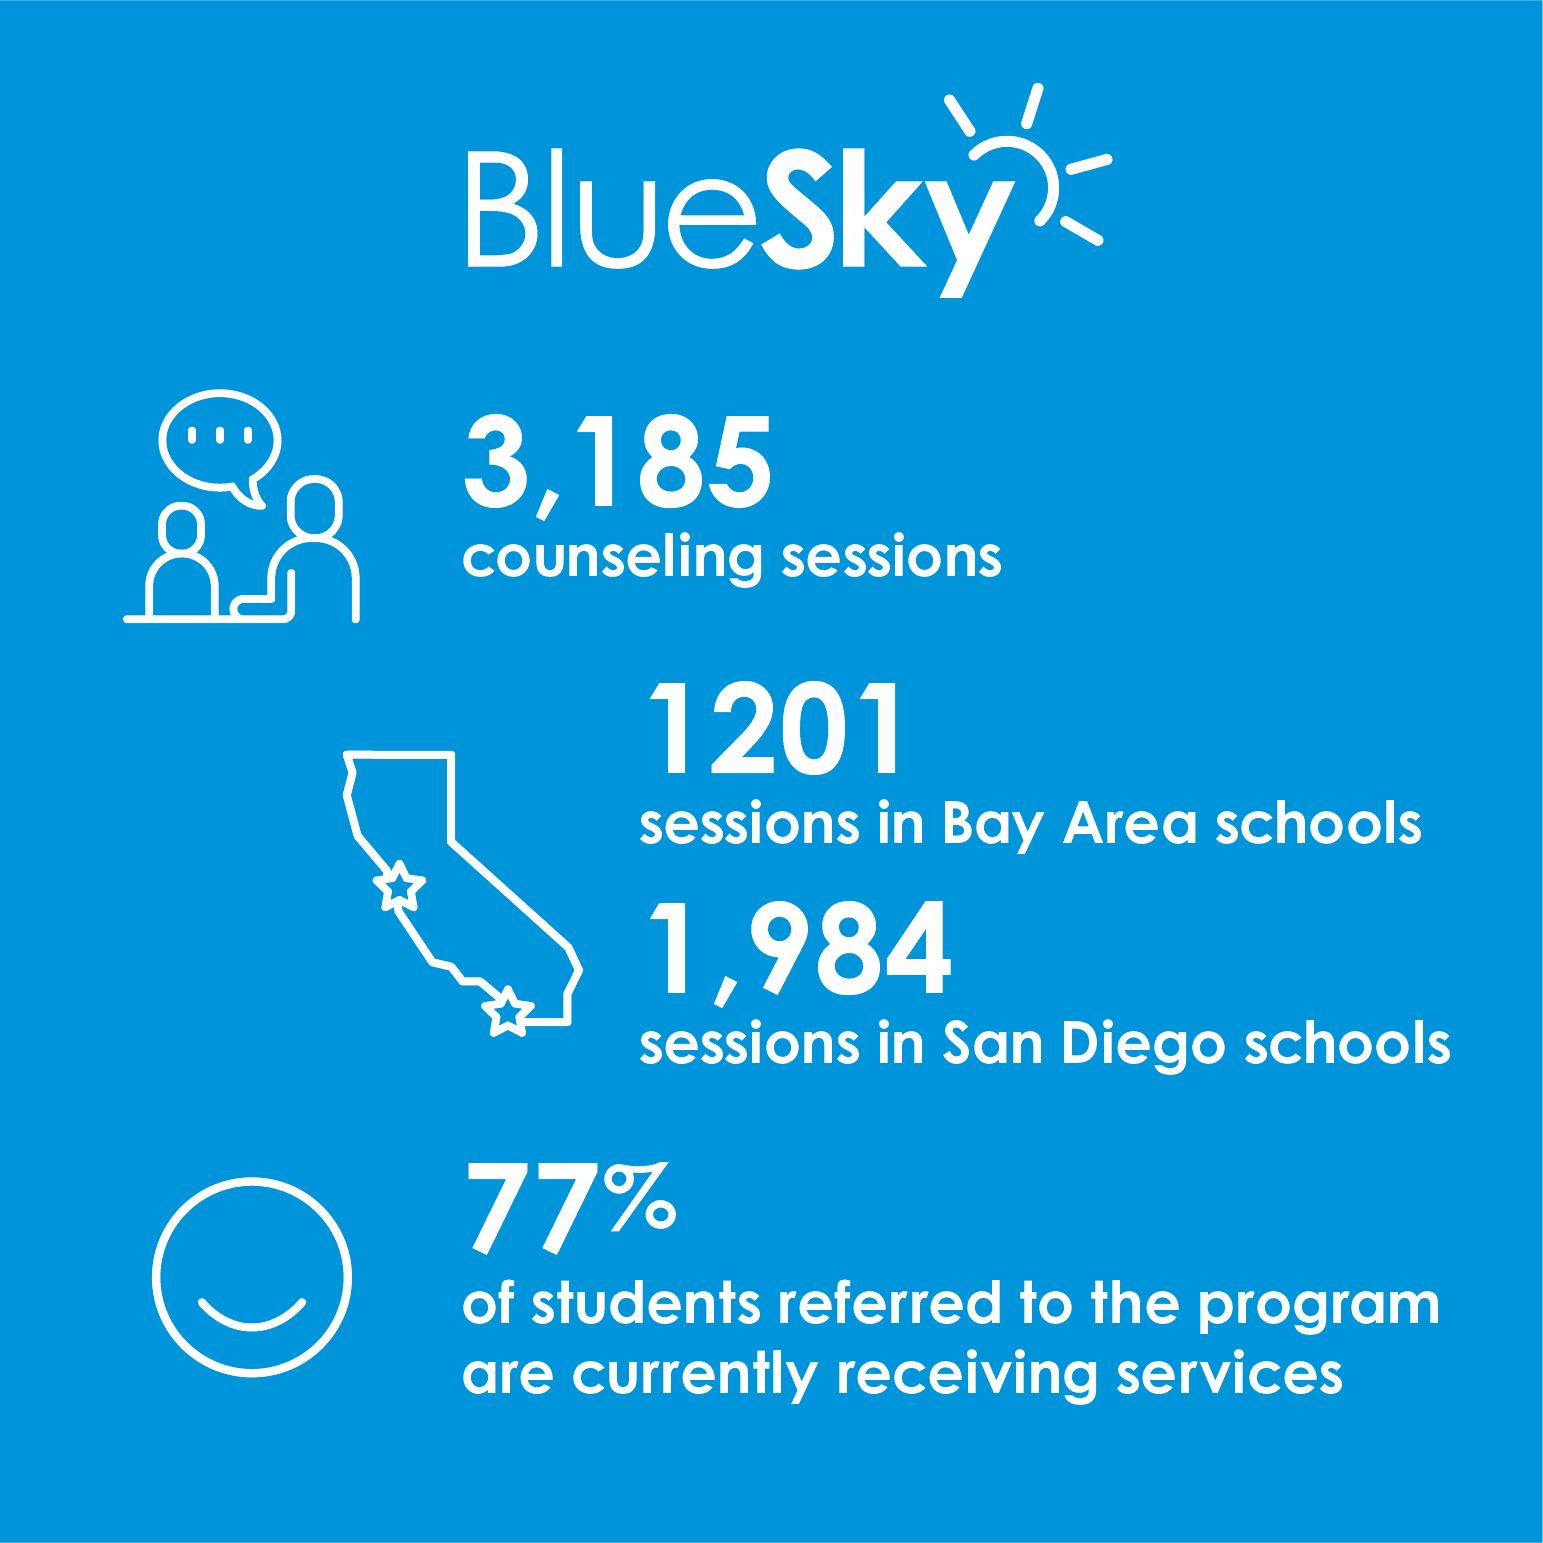 Blue-Sky-infographic-040720b-01